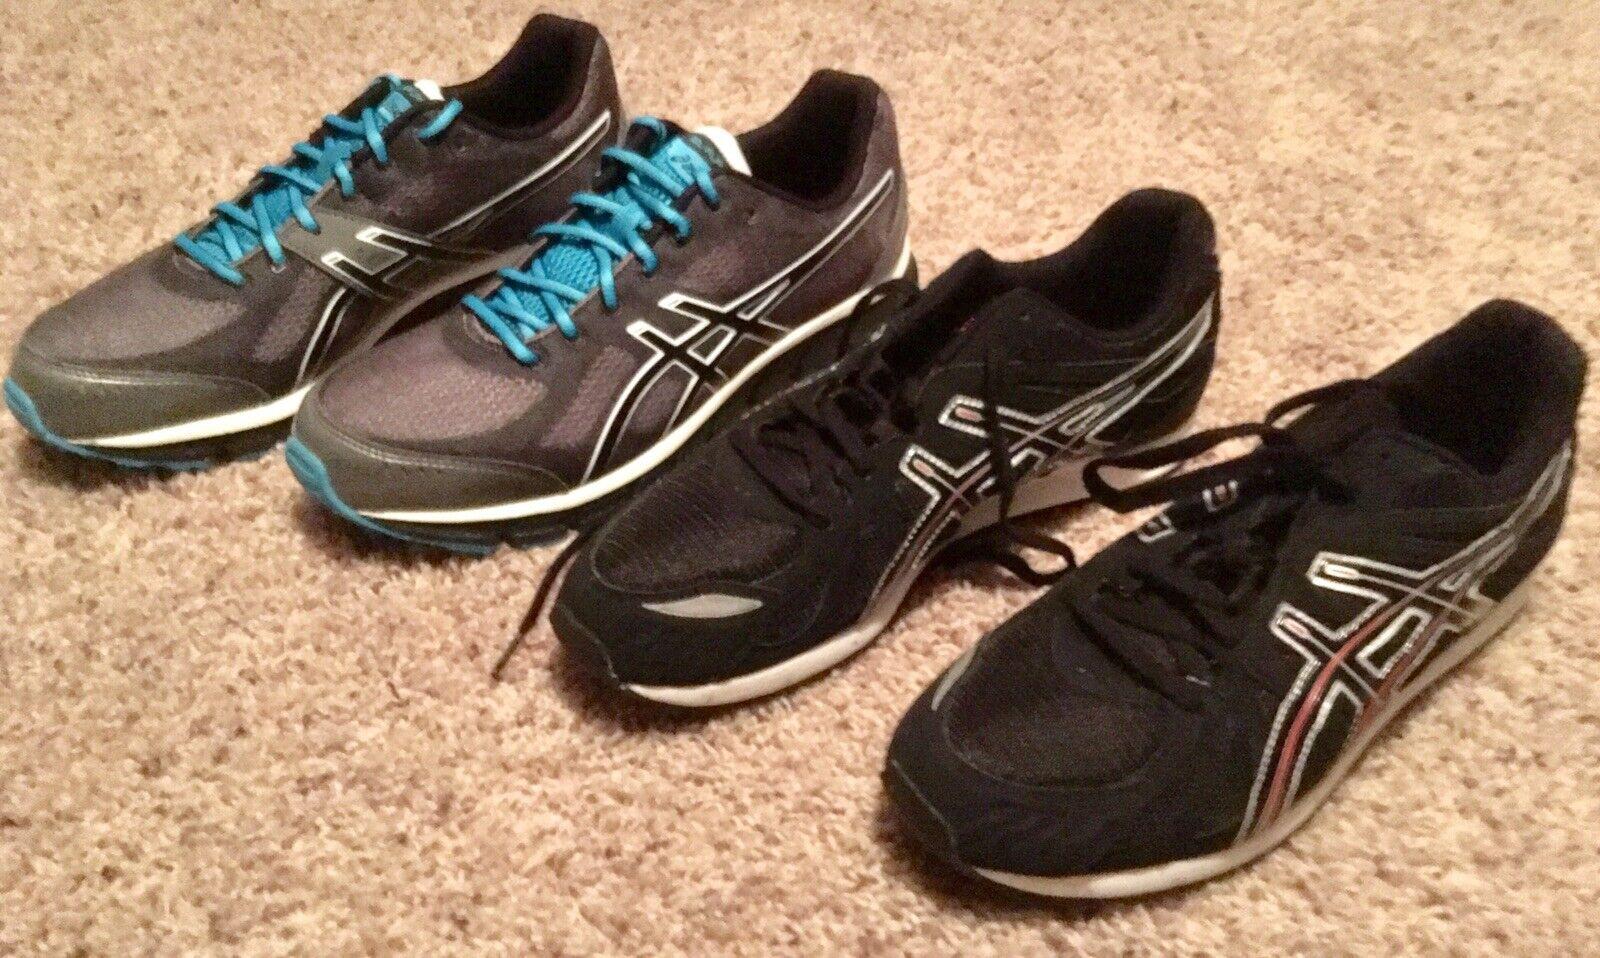 Asics Gel Flash  Run scarpe   2 Pair Men 65533;s sz 12 US NIB  alta qualità generale